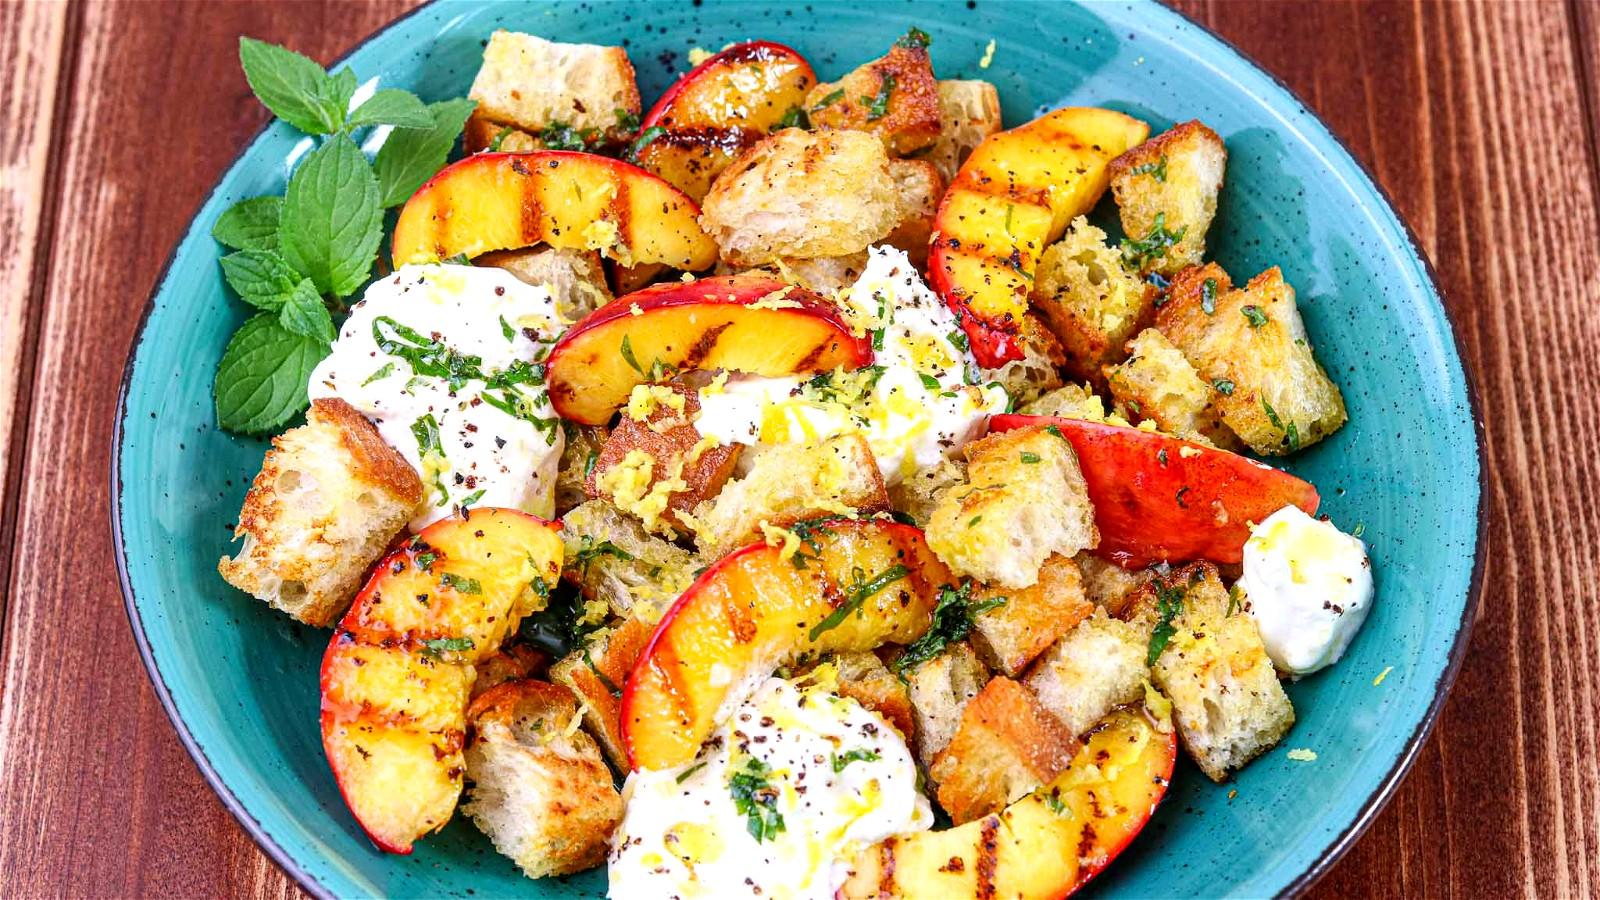 Image of Nektarinen-Brot-Salat mit Burrata